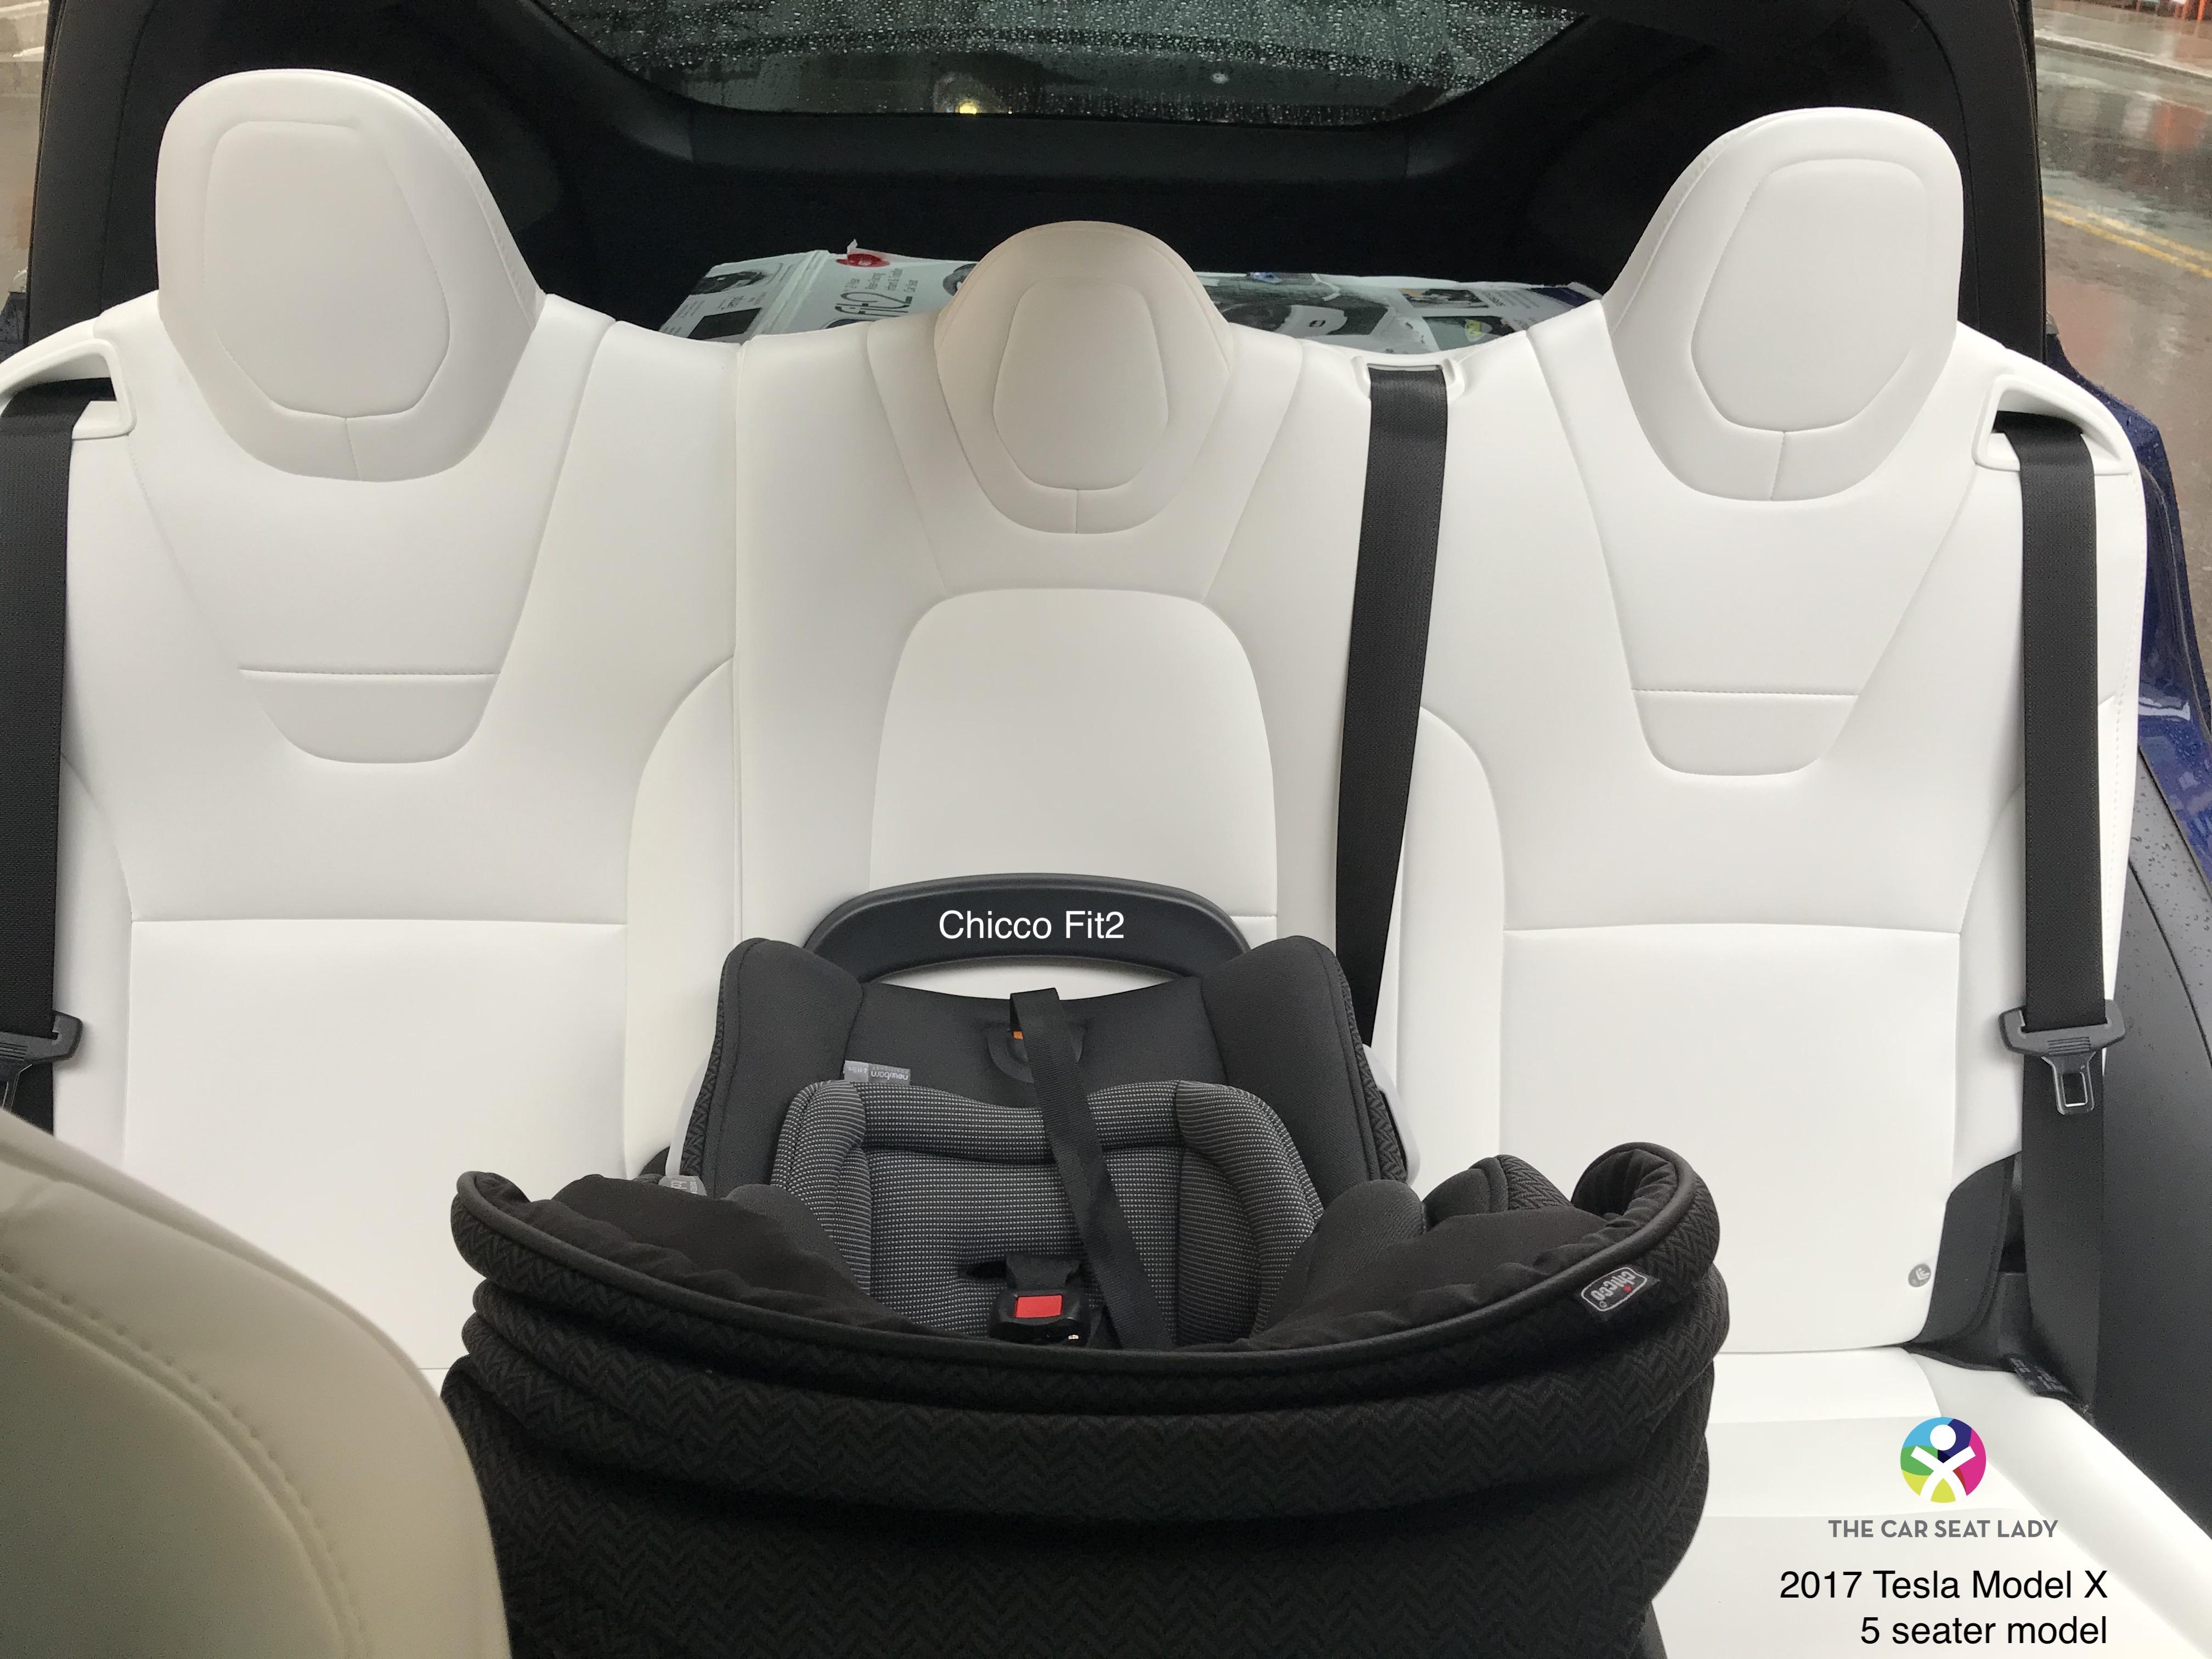 The Car Seat Lady Tesla Model X